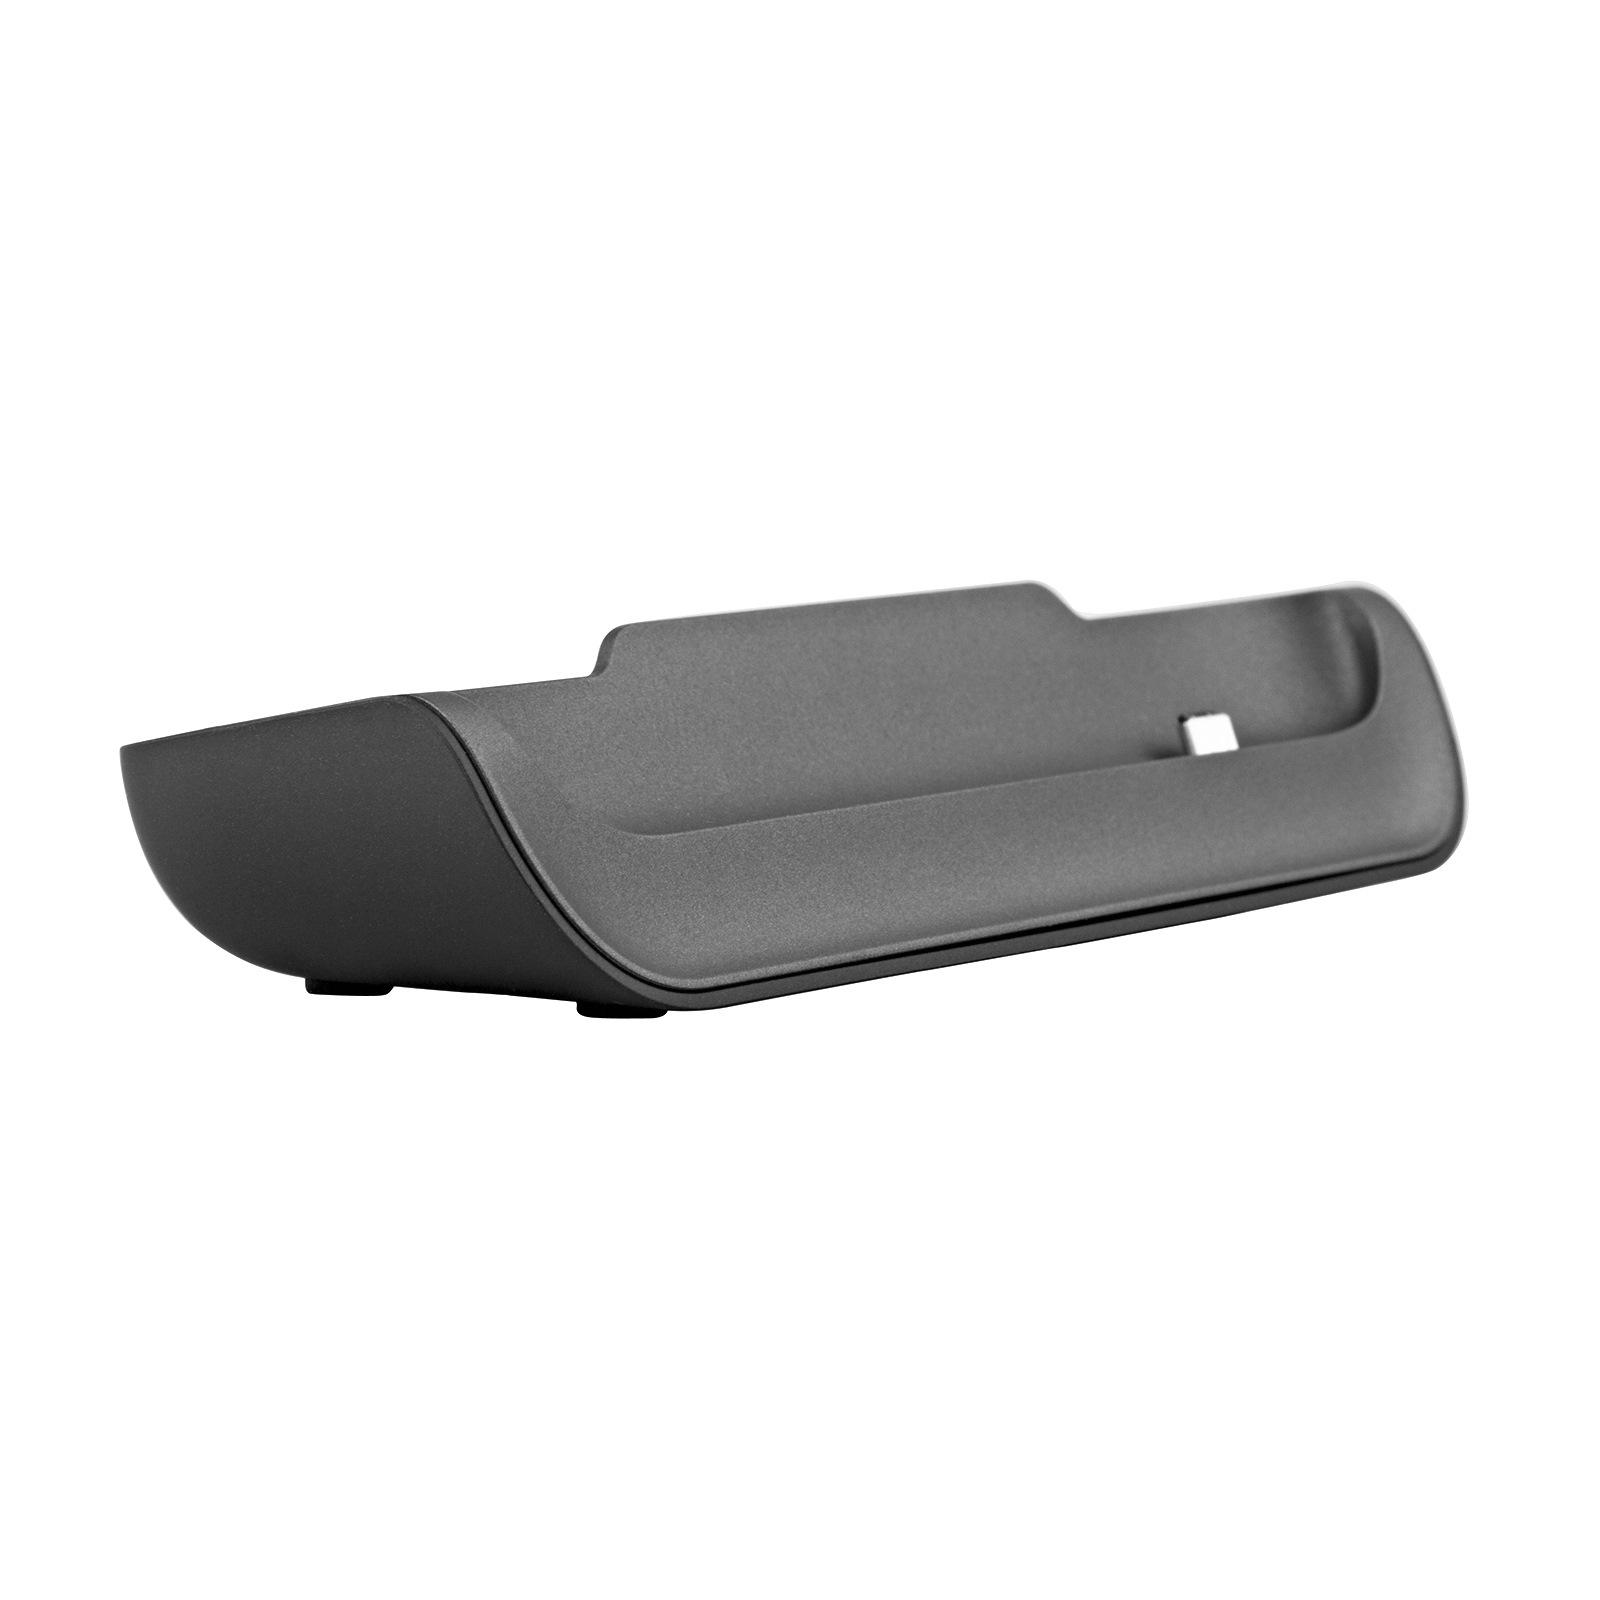 HTC CR S490 Desktop Cradle for STC Sensation 4G (Black)